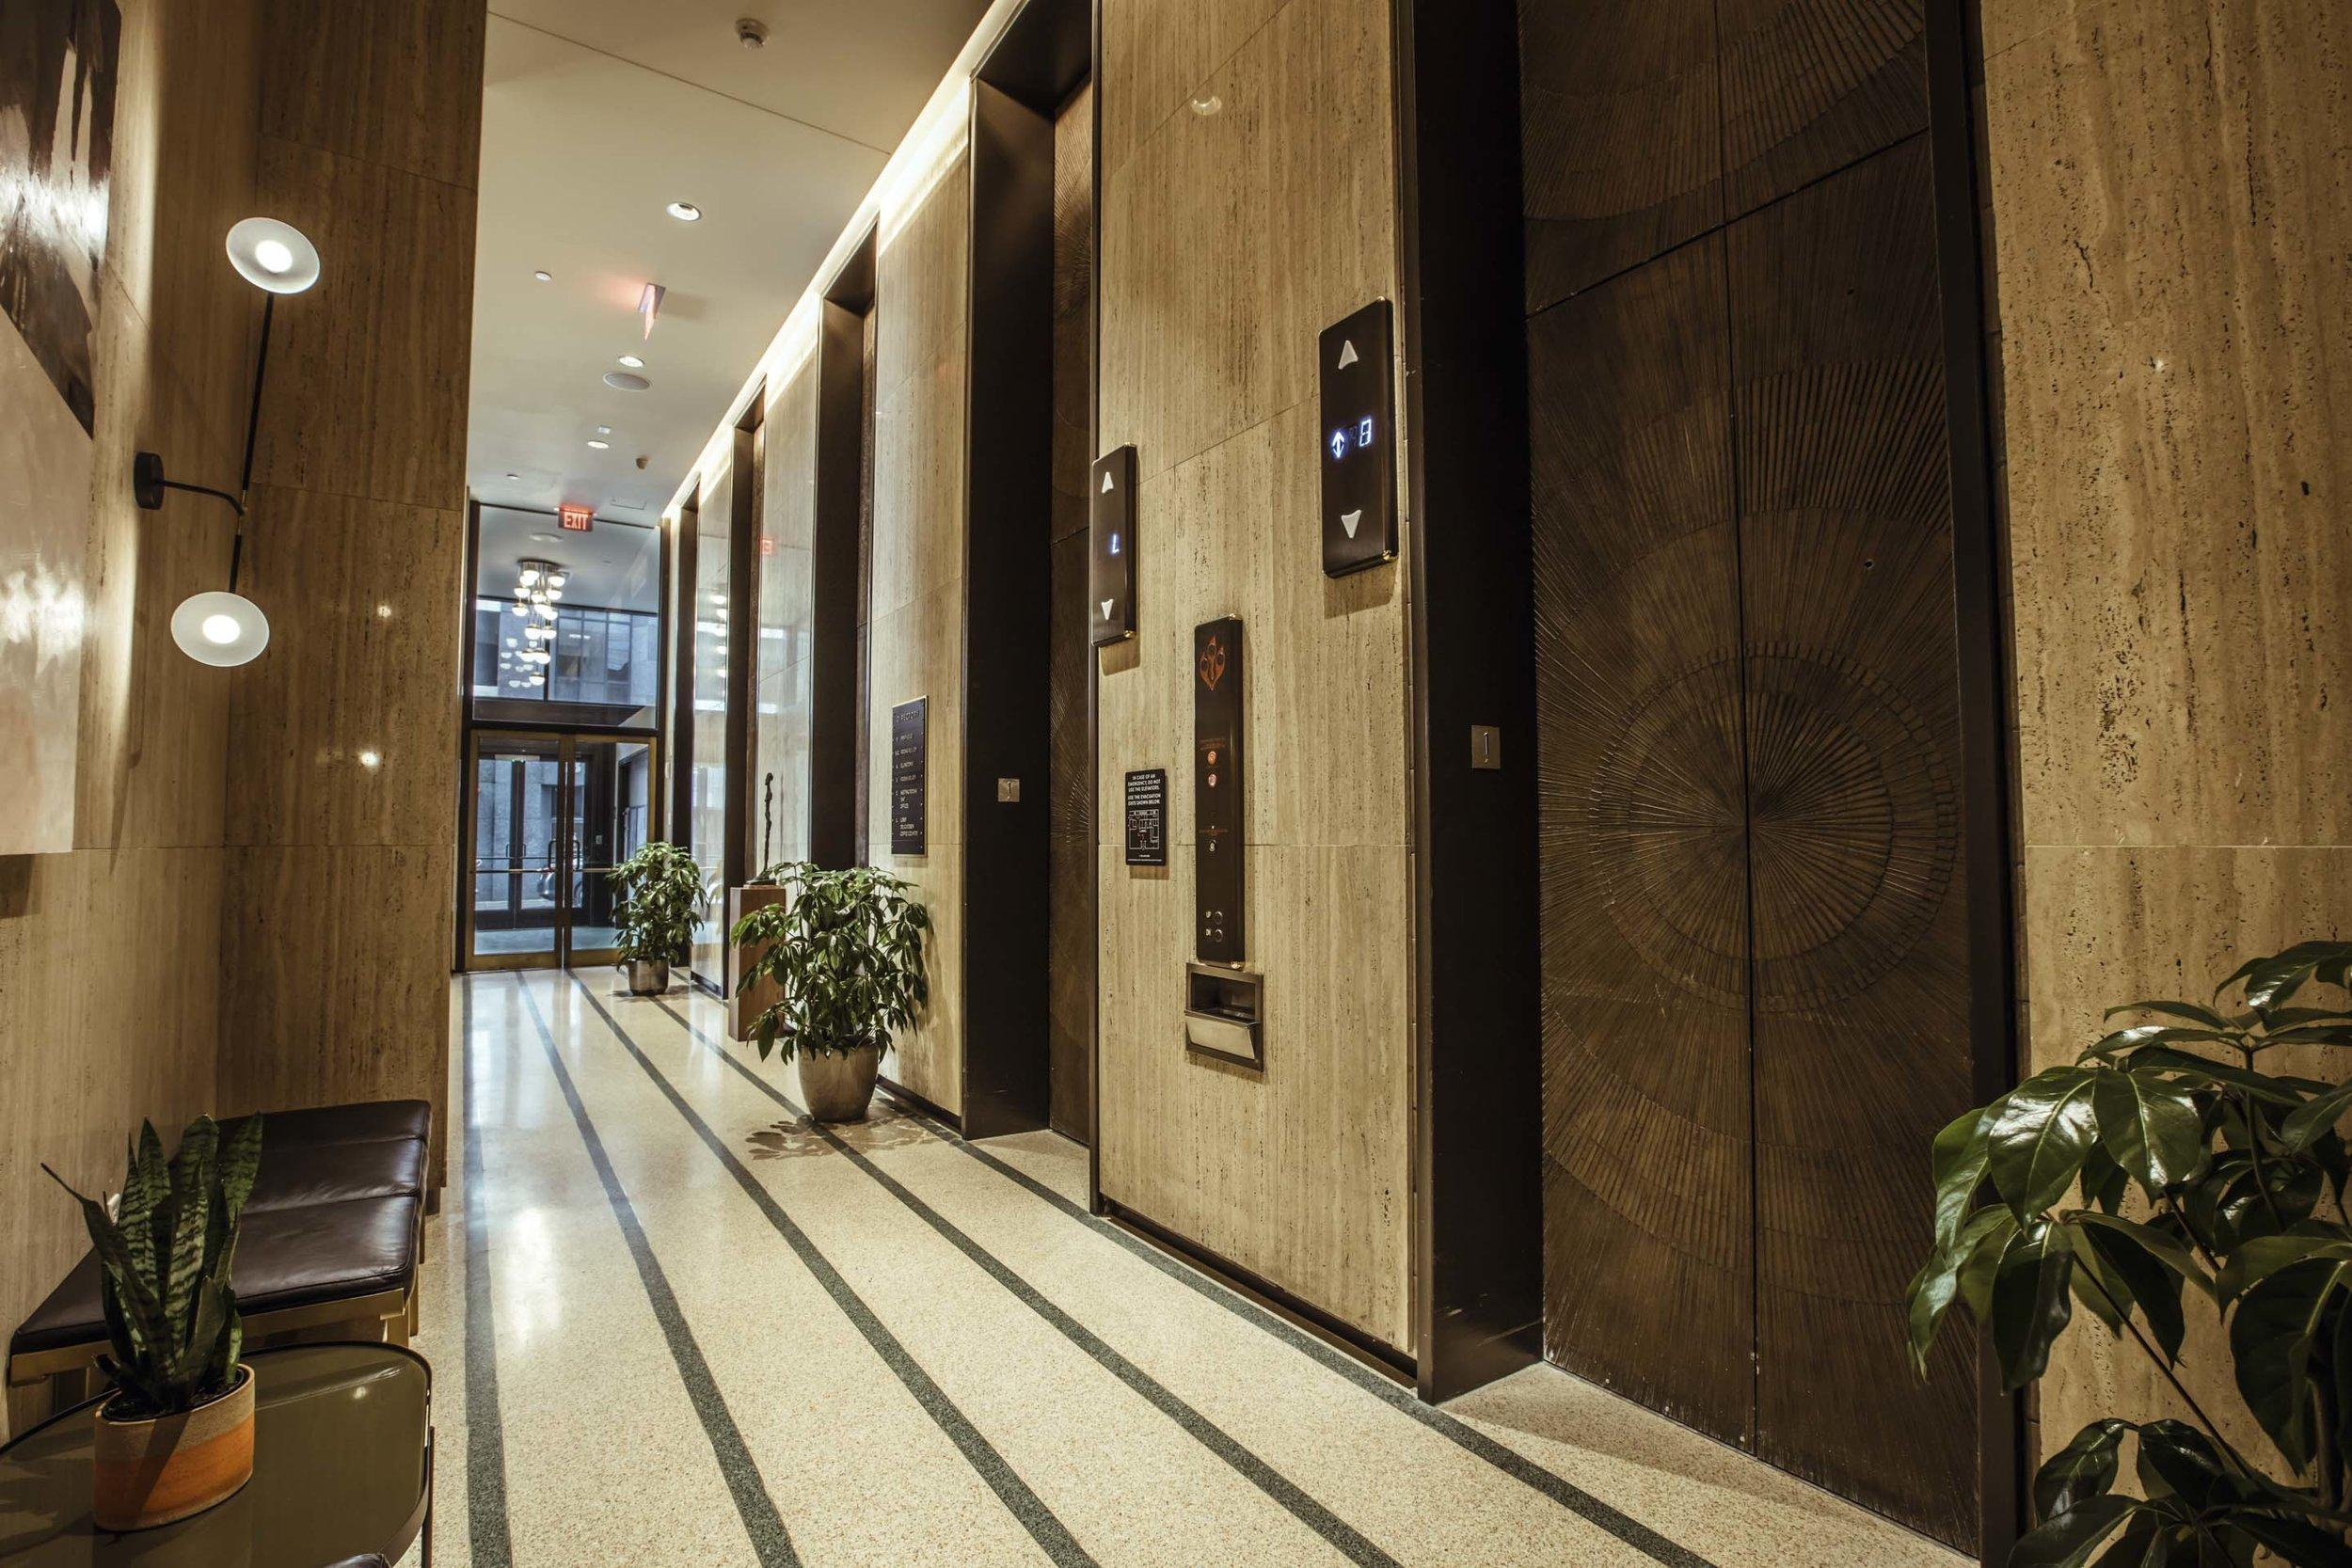 FAIRLANE HOTEL ARCHITECTURE WEB RES-16.jpg